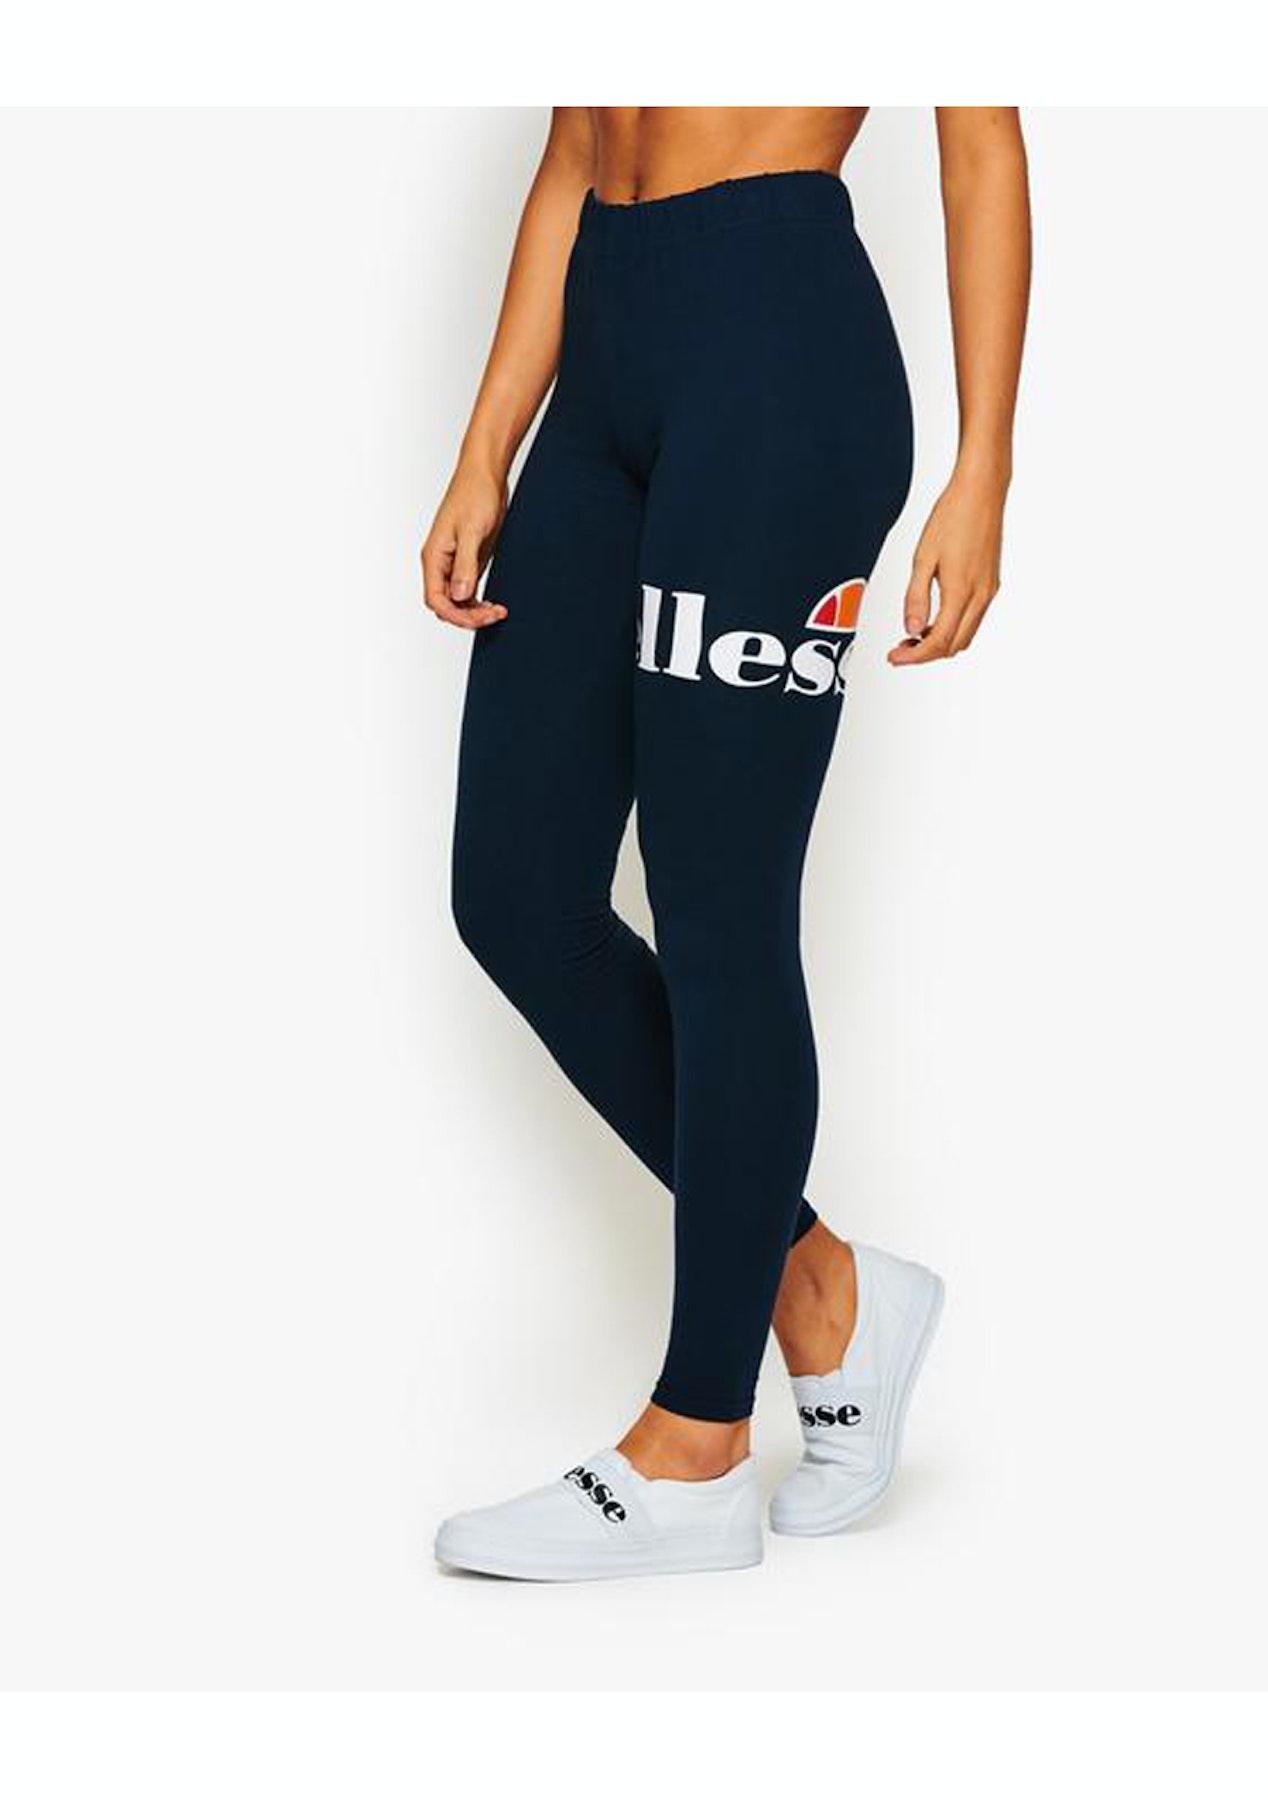 50-70%off incredible prices buy cheap Ellesse - Womens - Pemadulla Leggings - Navy